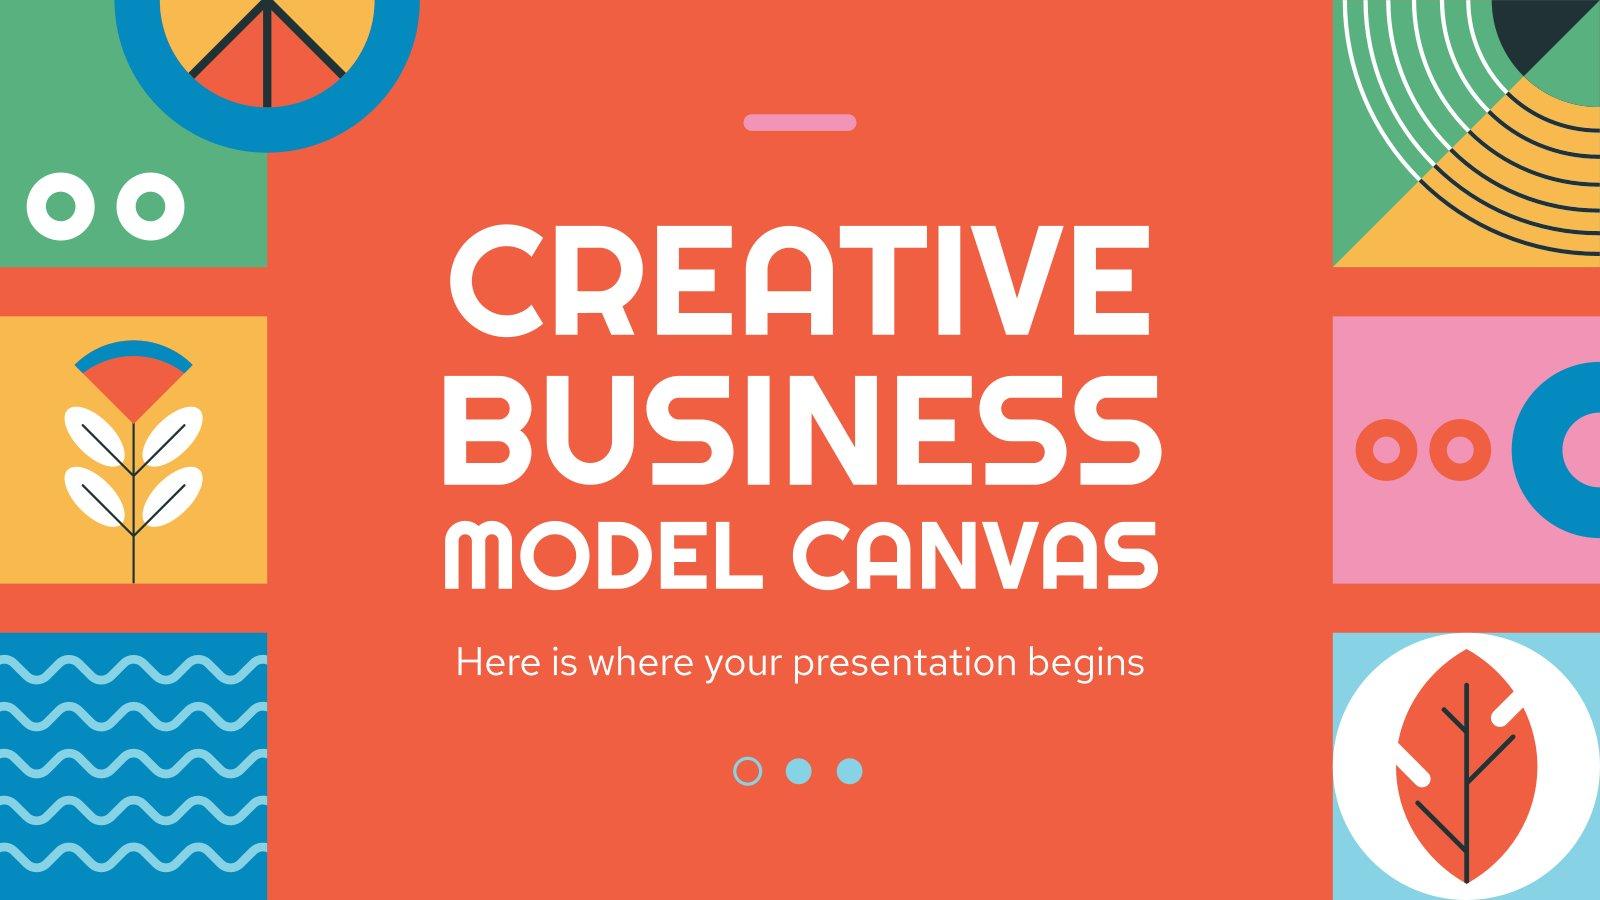 Creative Business Model Canvas presentation template